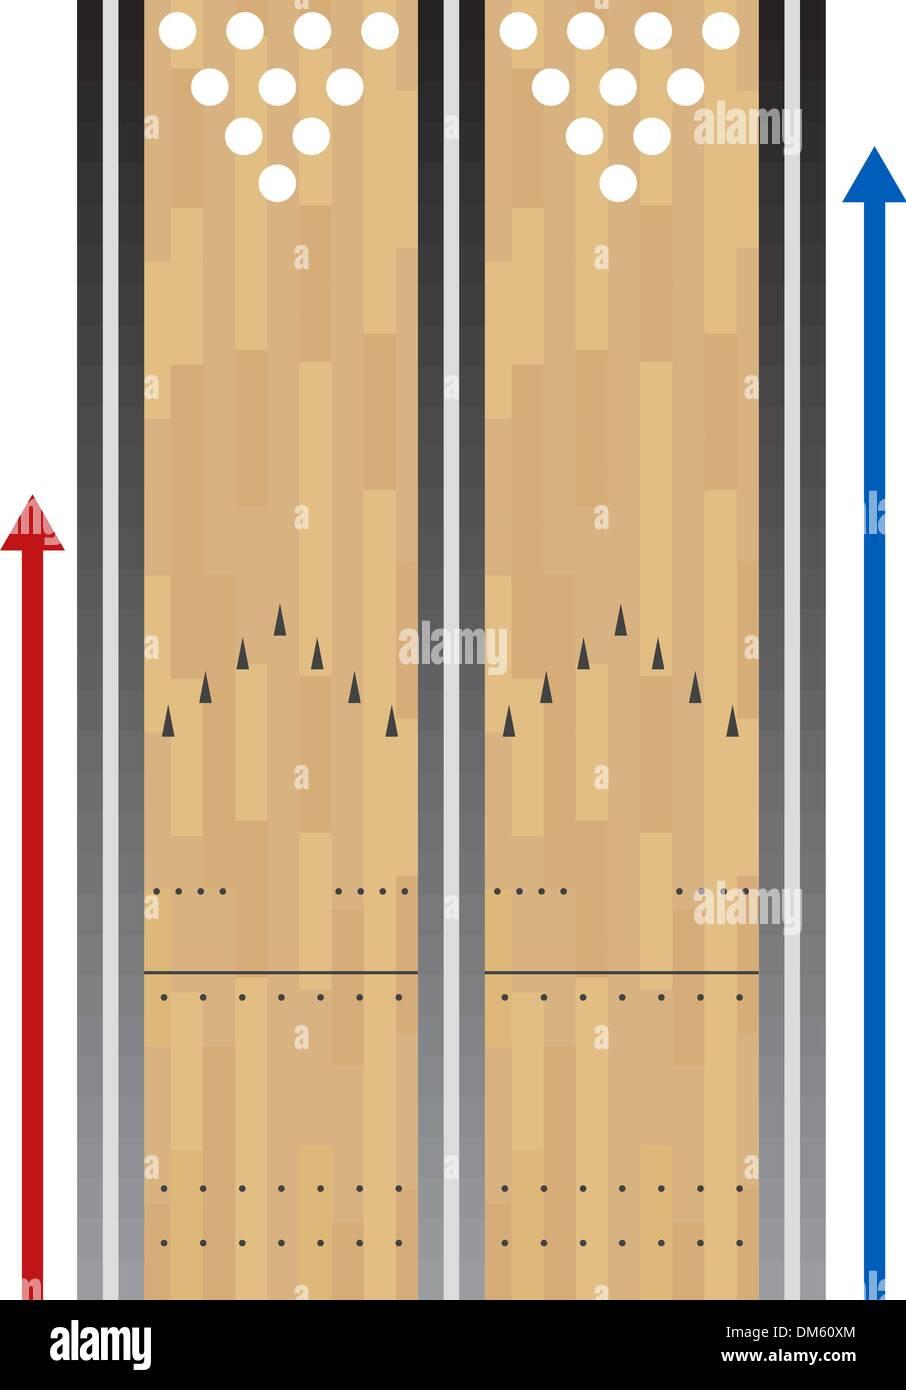 medium resolution of bowling lane chart